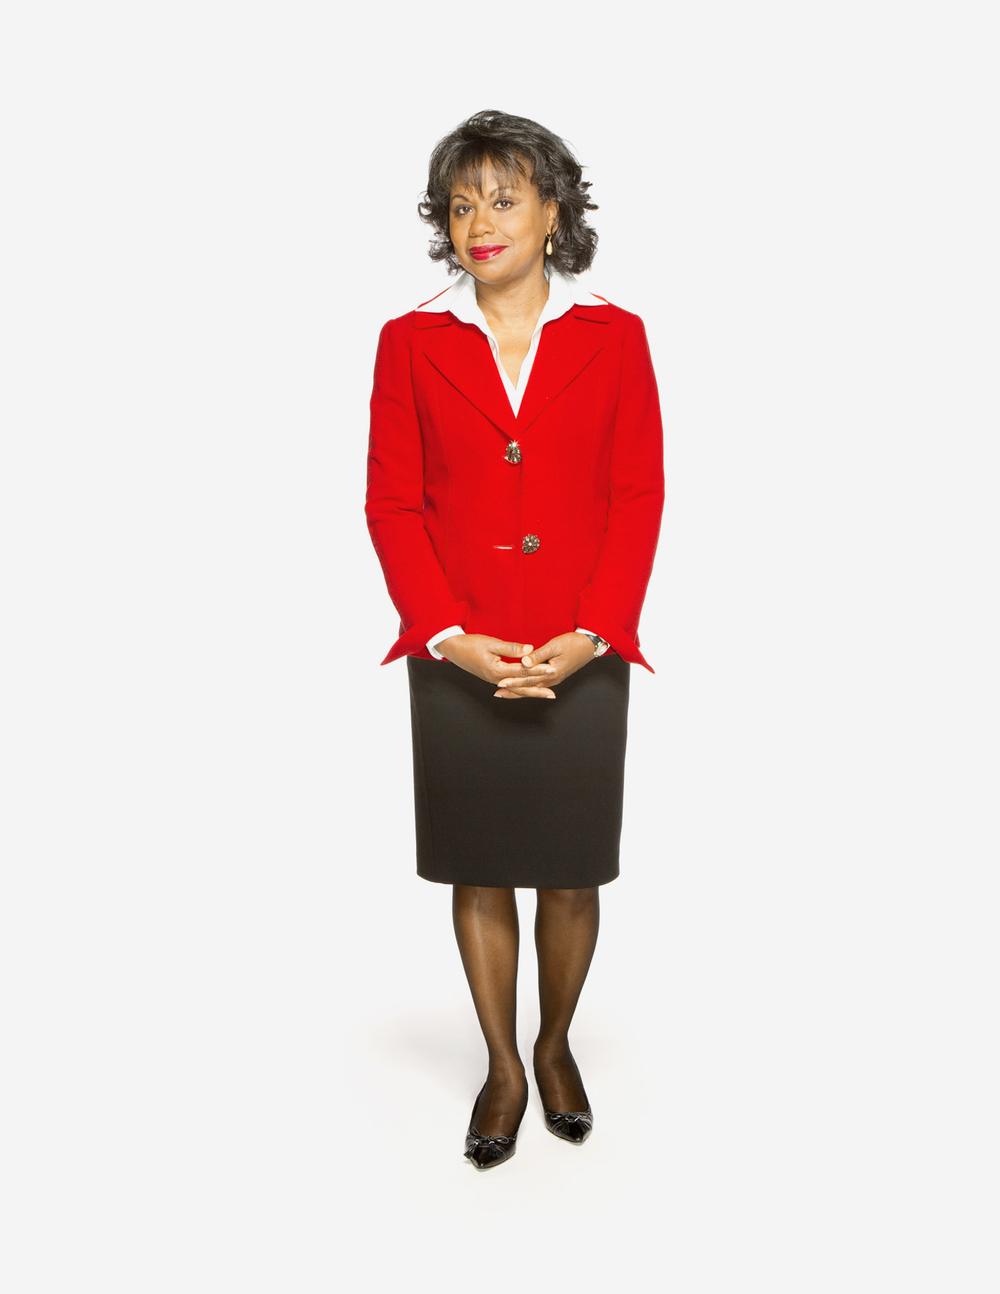 Anita Hill photographed by Adam DeTour